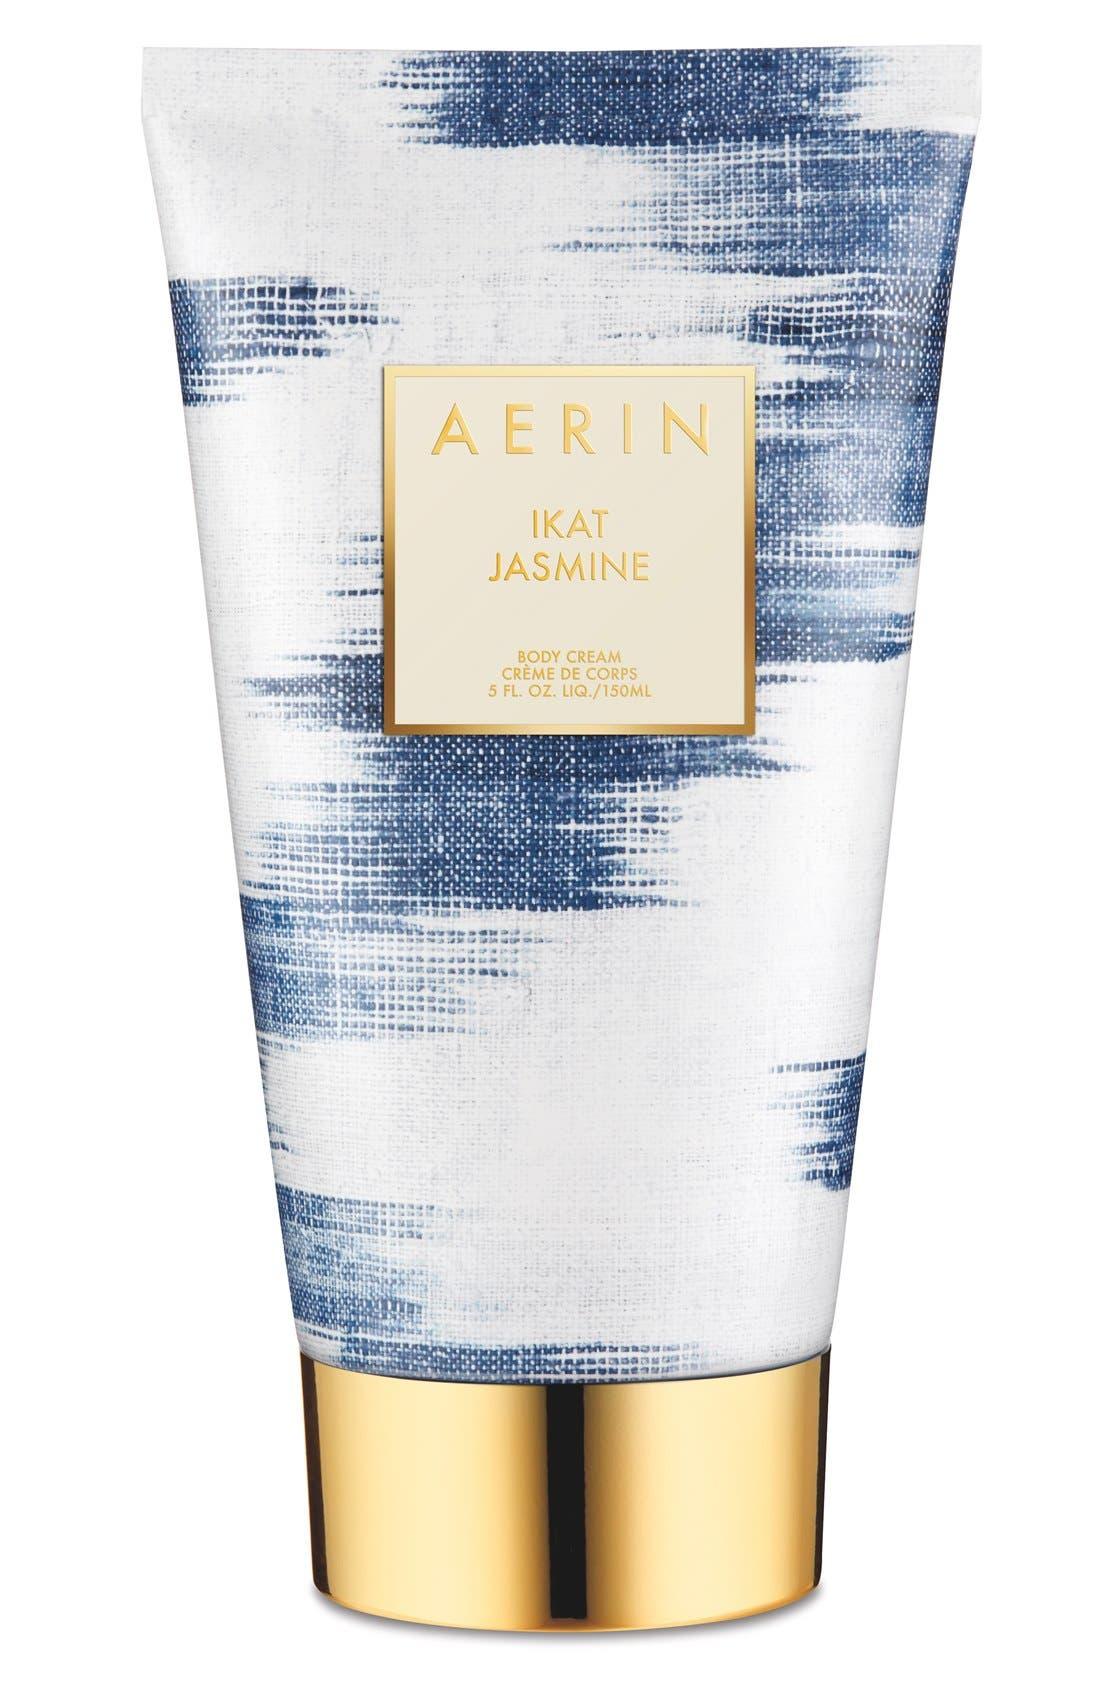 AERIN Beauty Ikat Jasmine Body Cream